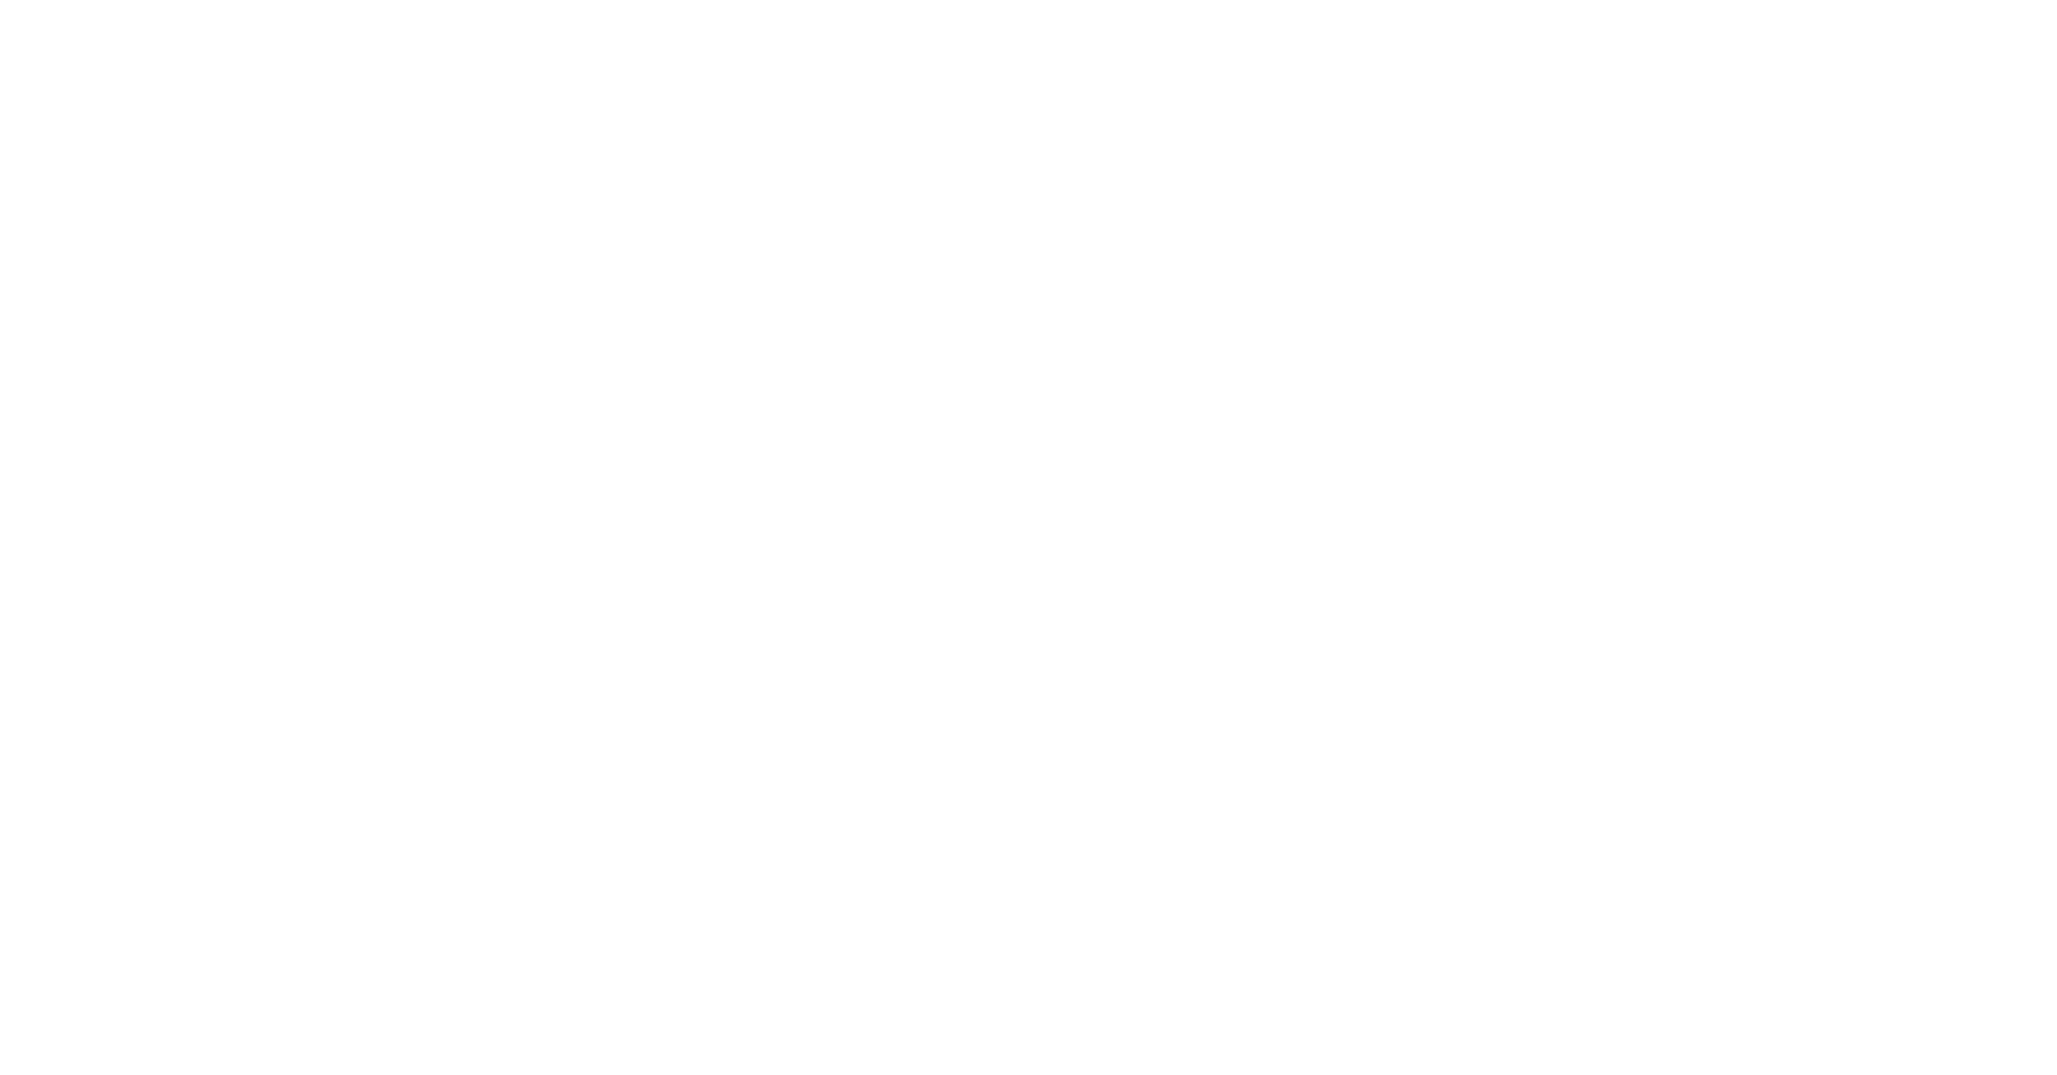 www.puurbruidsgeluk.nl